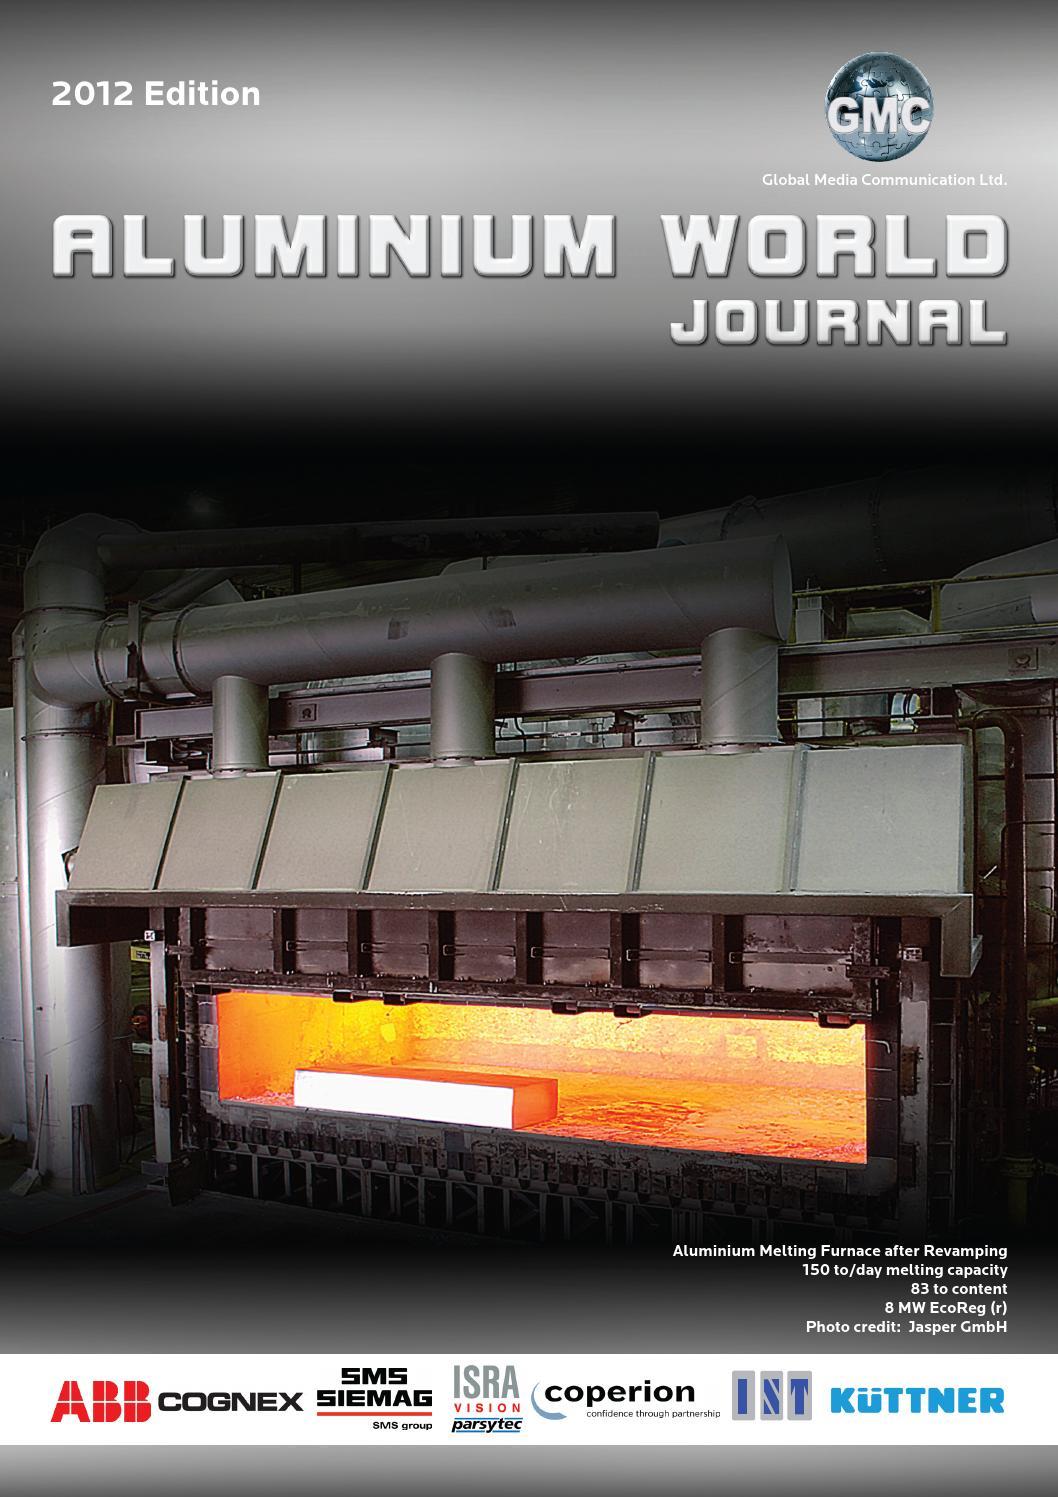 aluminium world journal 2012 edition by gmc online   issuu